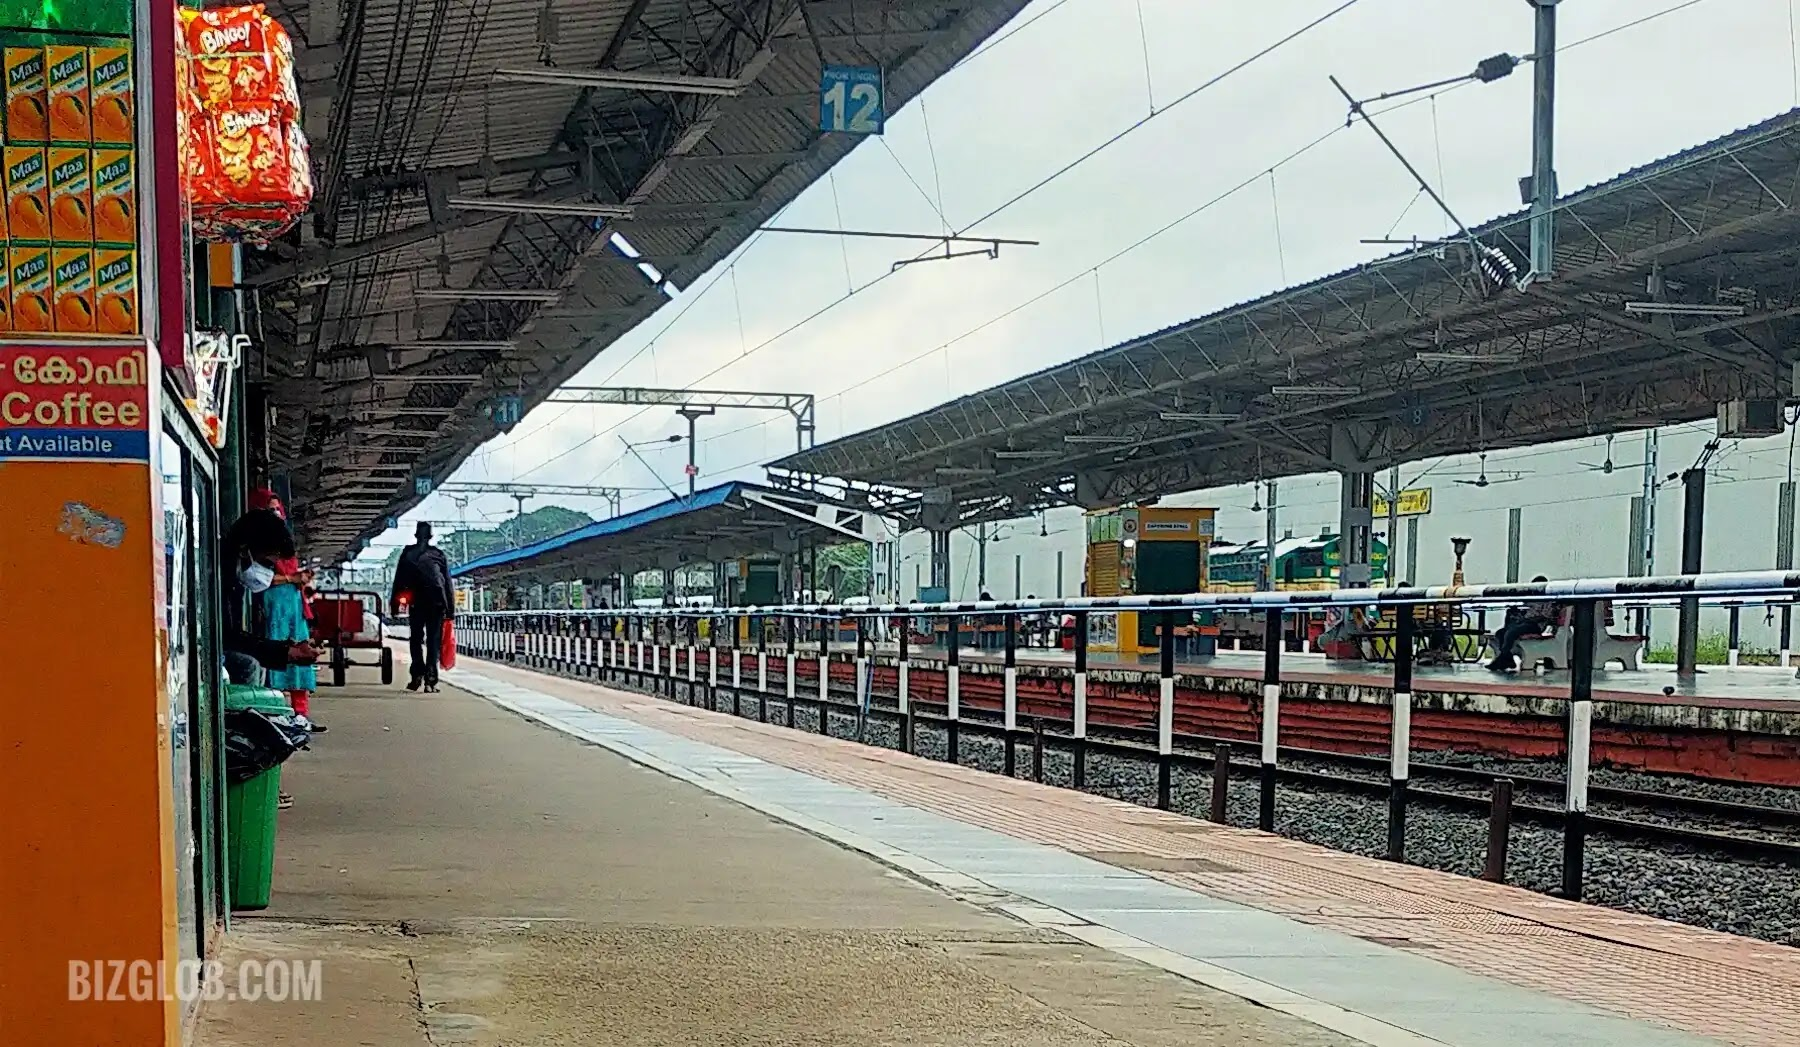 Kollam railway station platform, Indian Railway